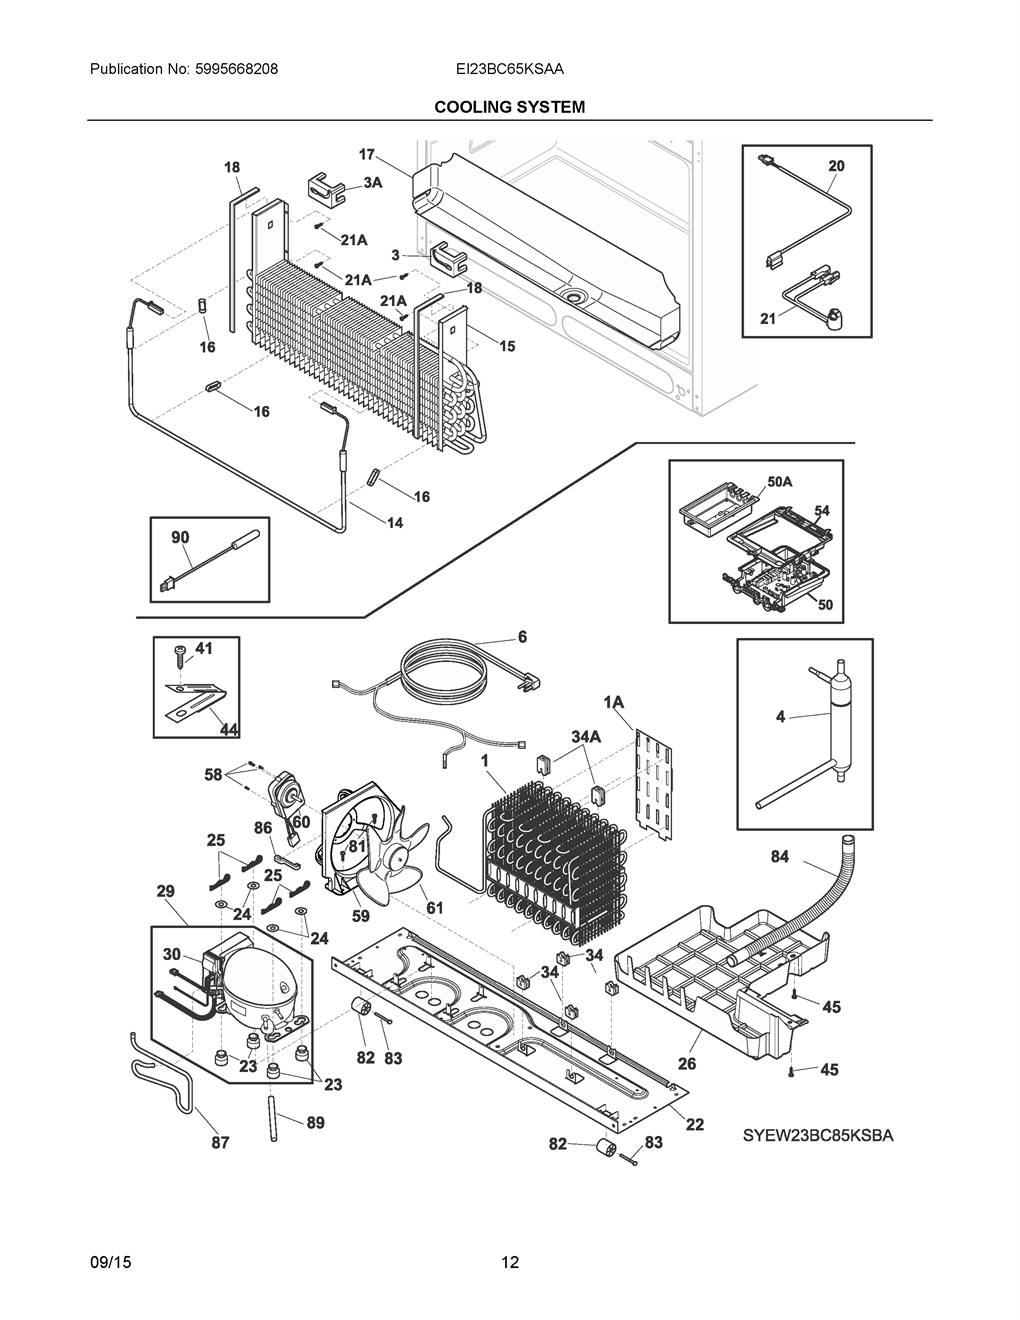 Electrolux EI23BC65KSAA Refrigerator Condenser Fan Shroud